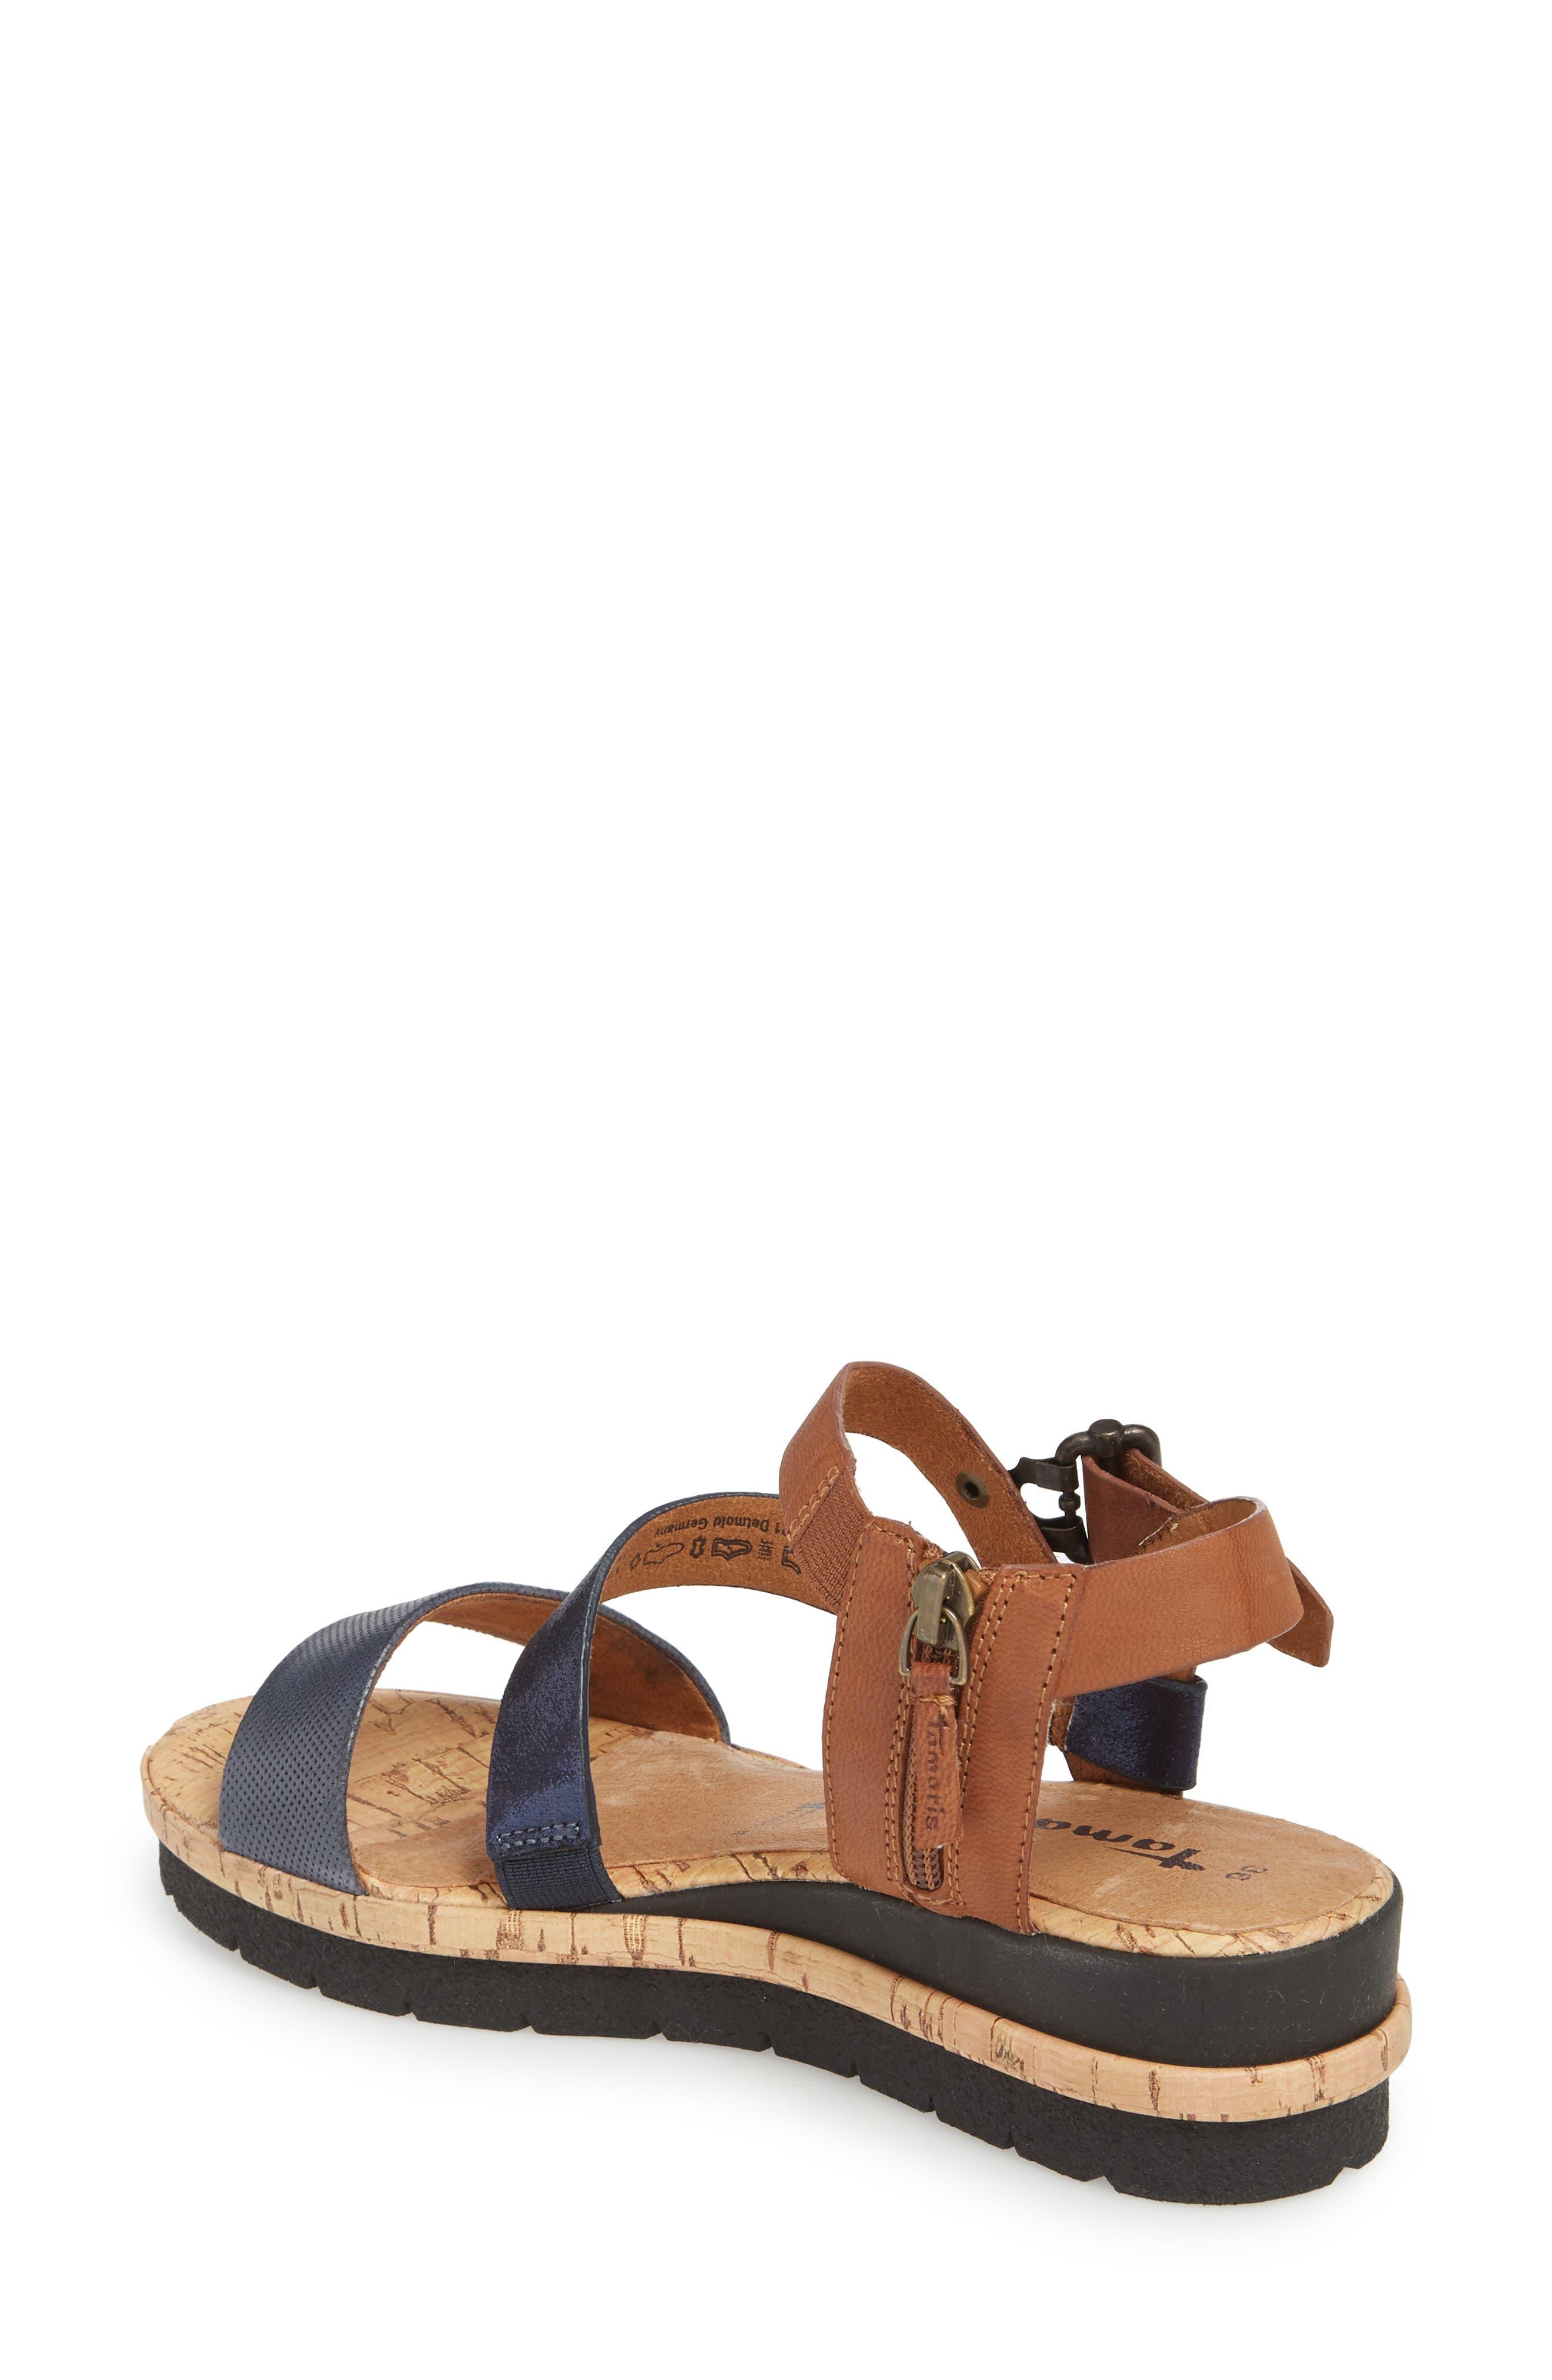 Eda Diagonal Strap Wedge Sandal,                             Alternate thumbnail 2, color,                             Navy/ Cognac Leather